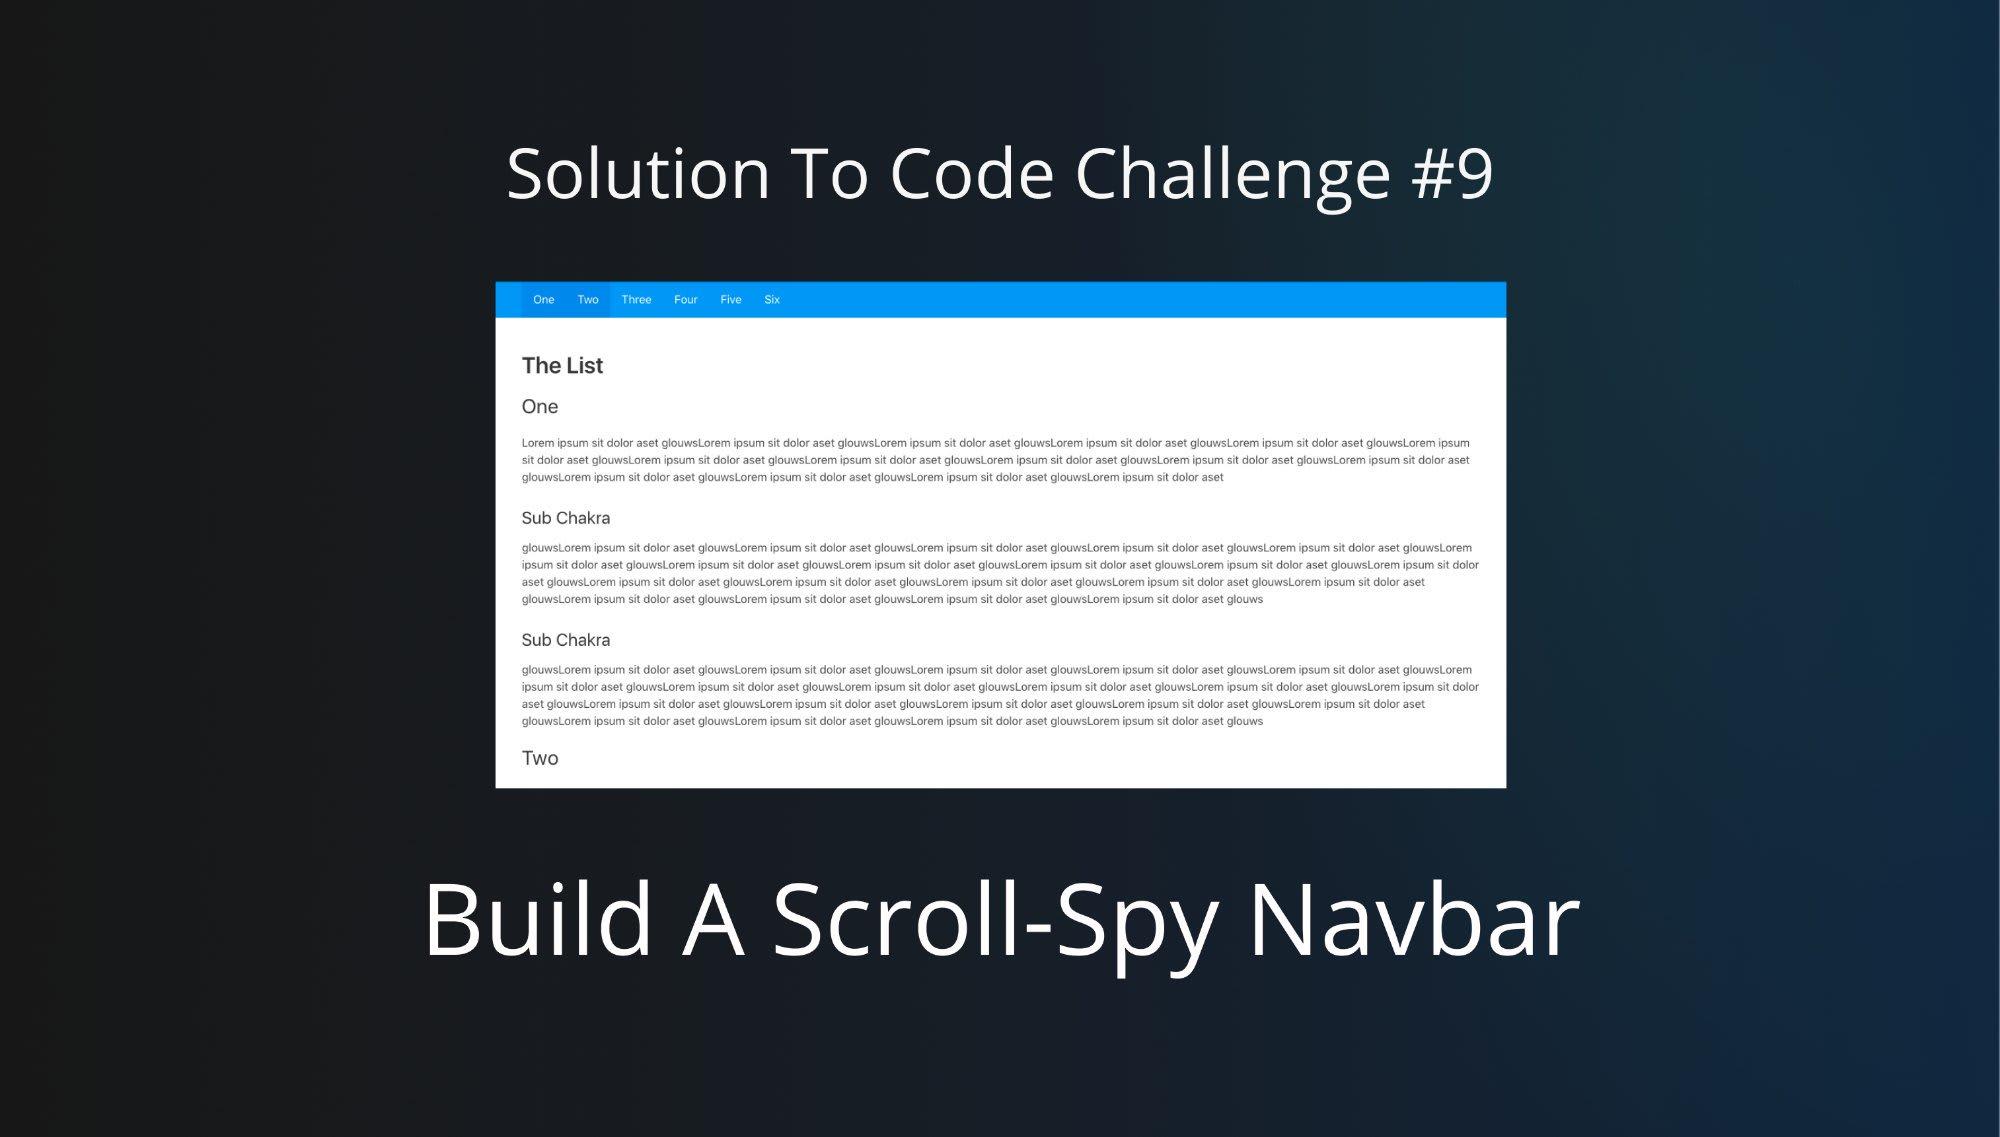 Build A Scroll-Spy Navbar (Solution to Code Challenge #9